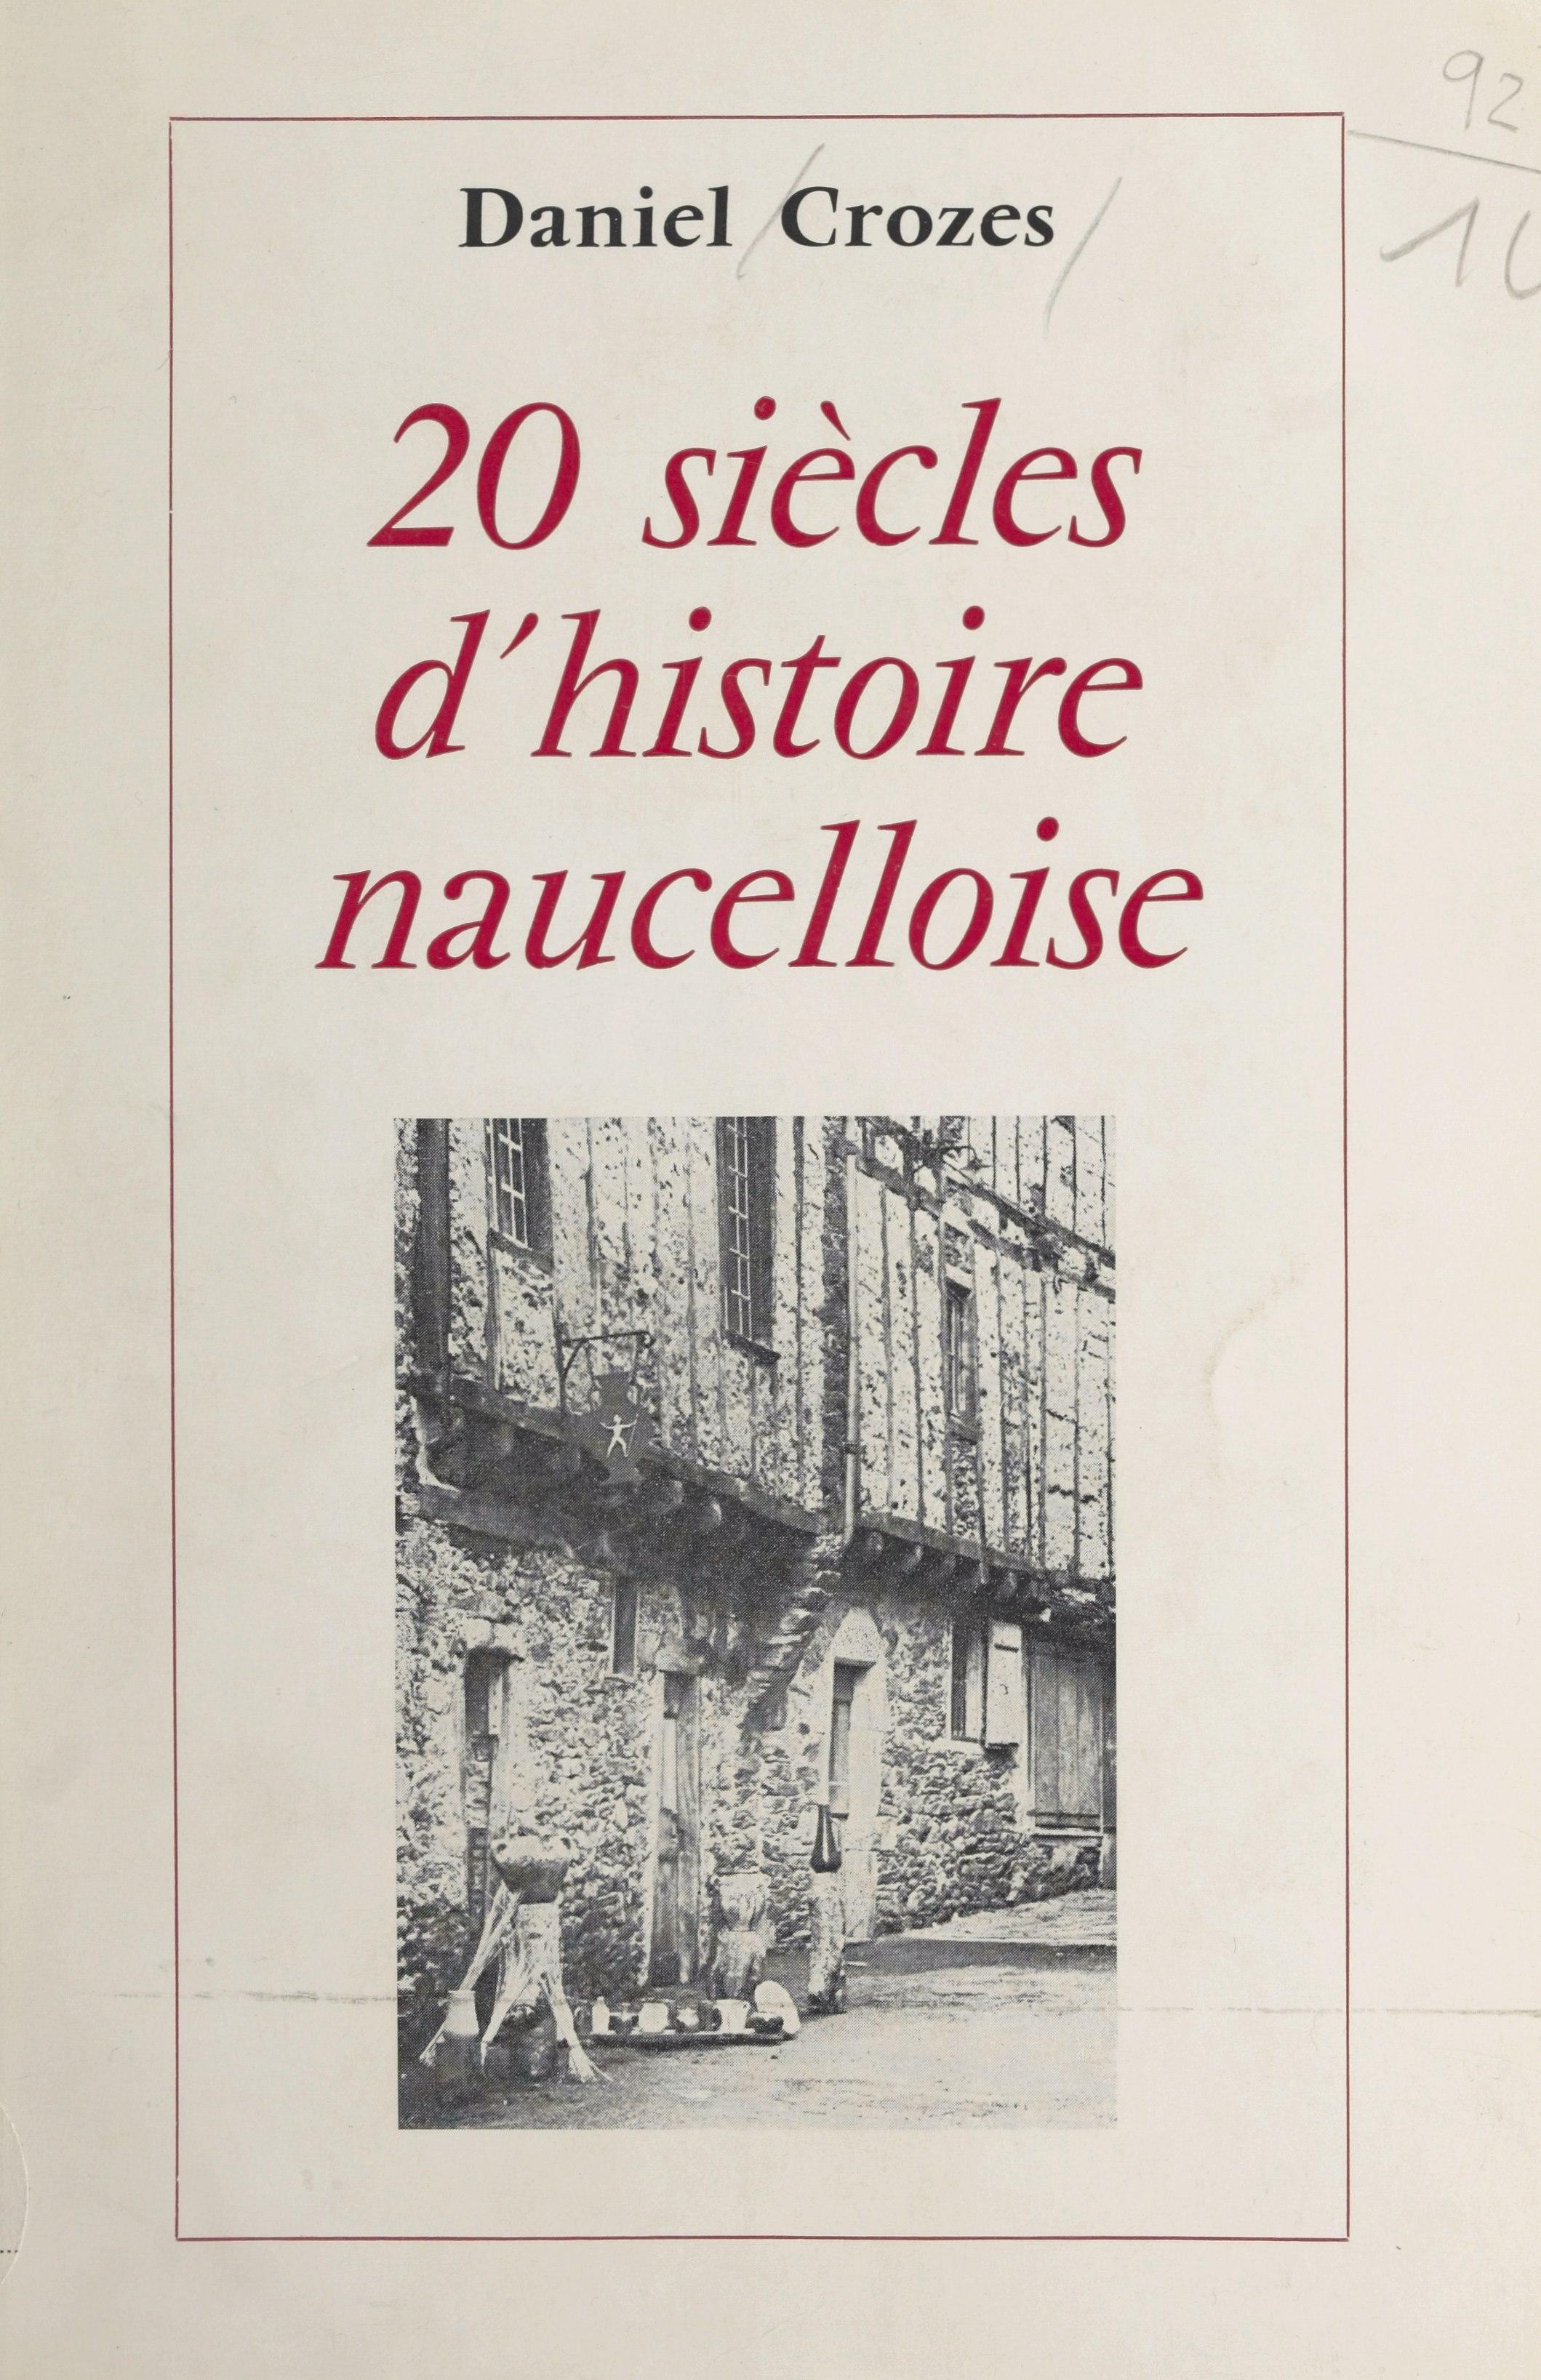 20 siècles d'histoire naucelloise